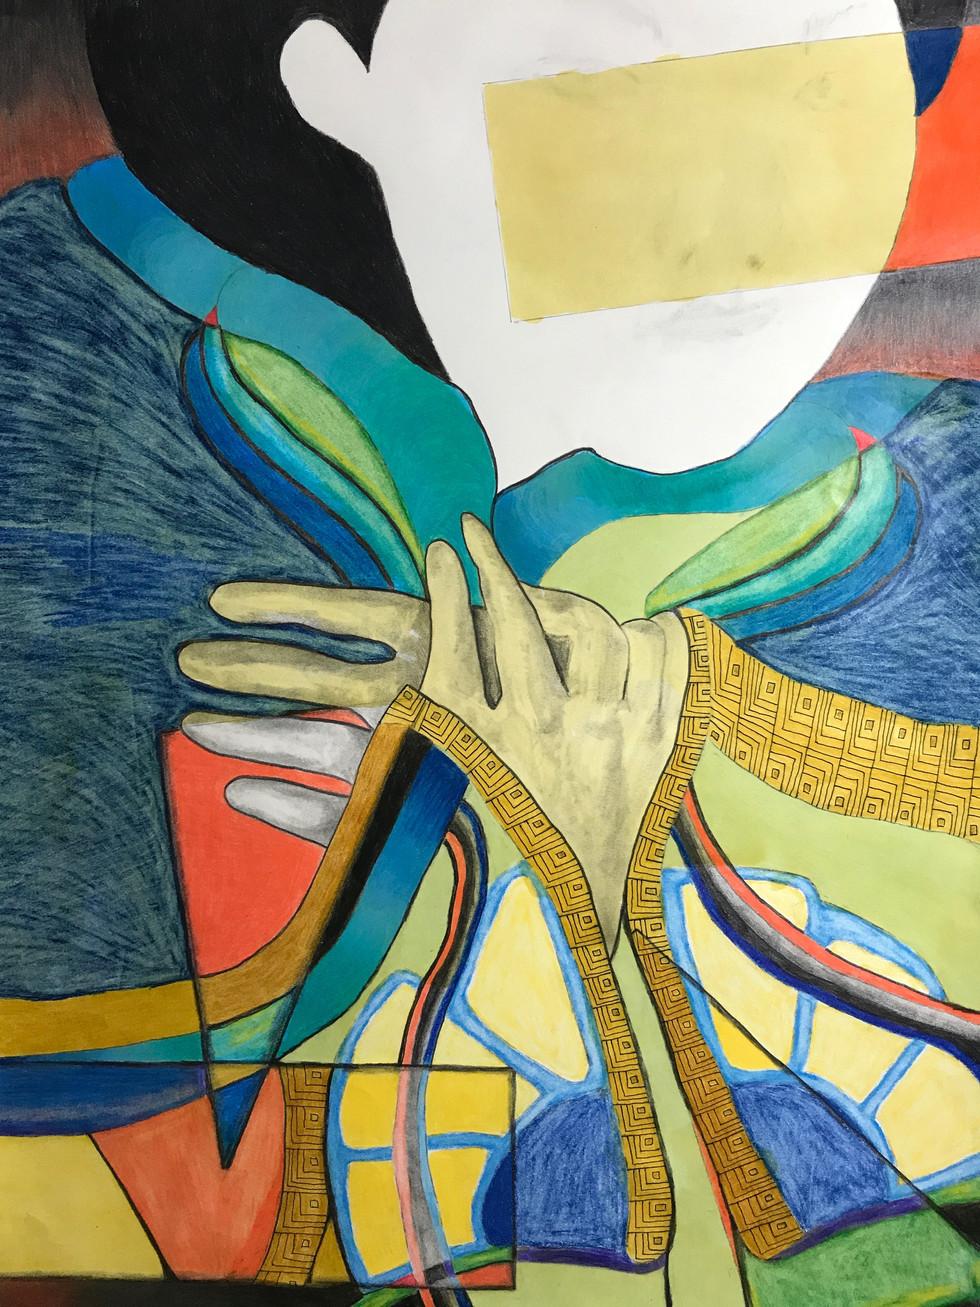 Demetri Fisher art - prolixis 1